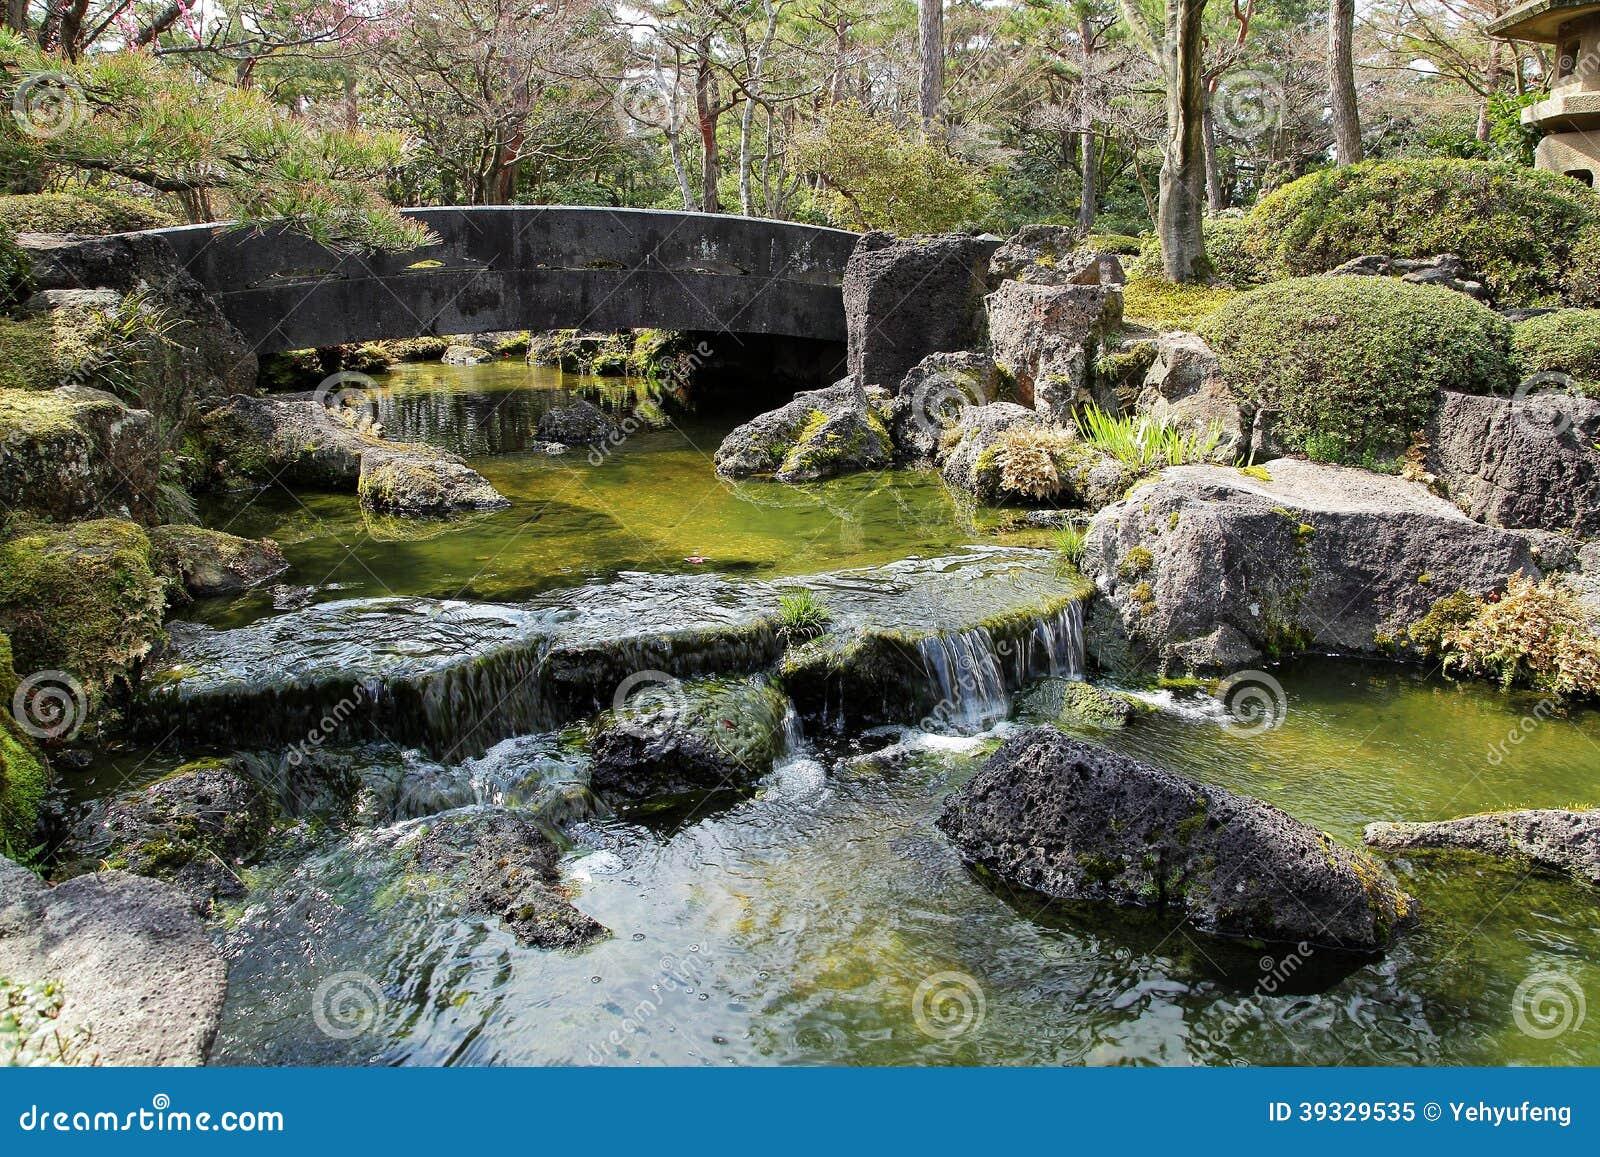 bridge flowing garden japanese landscape over quiet stone